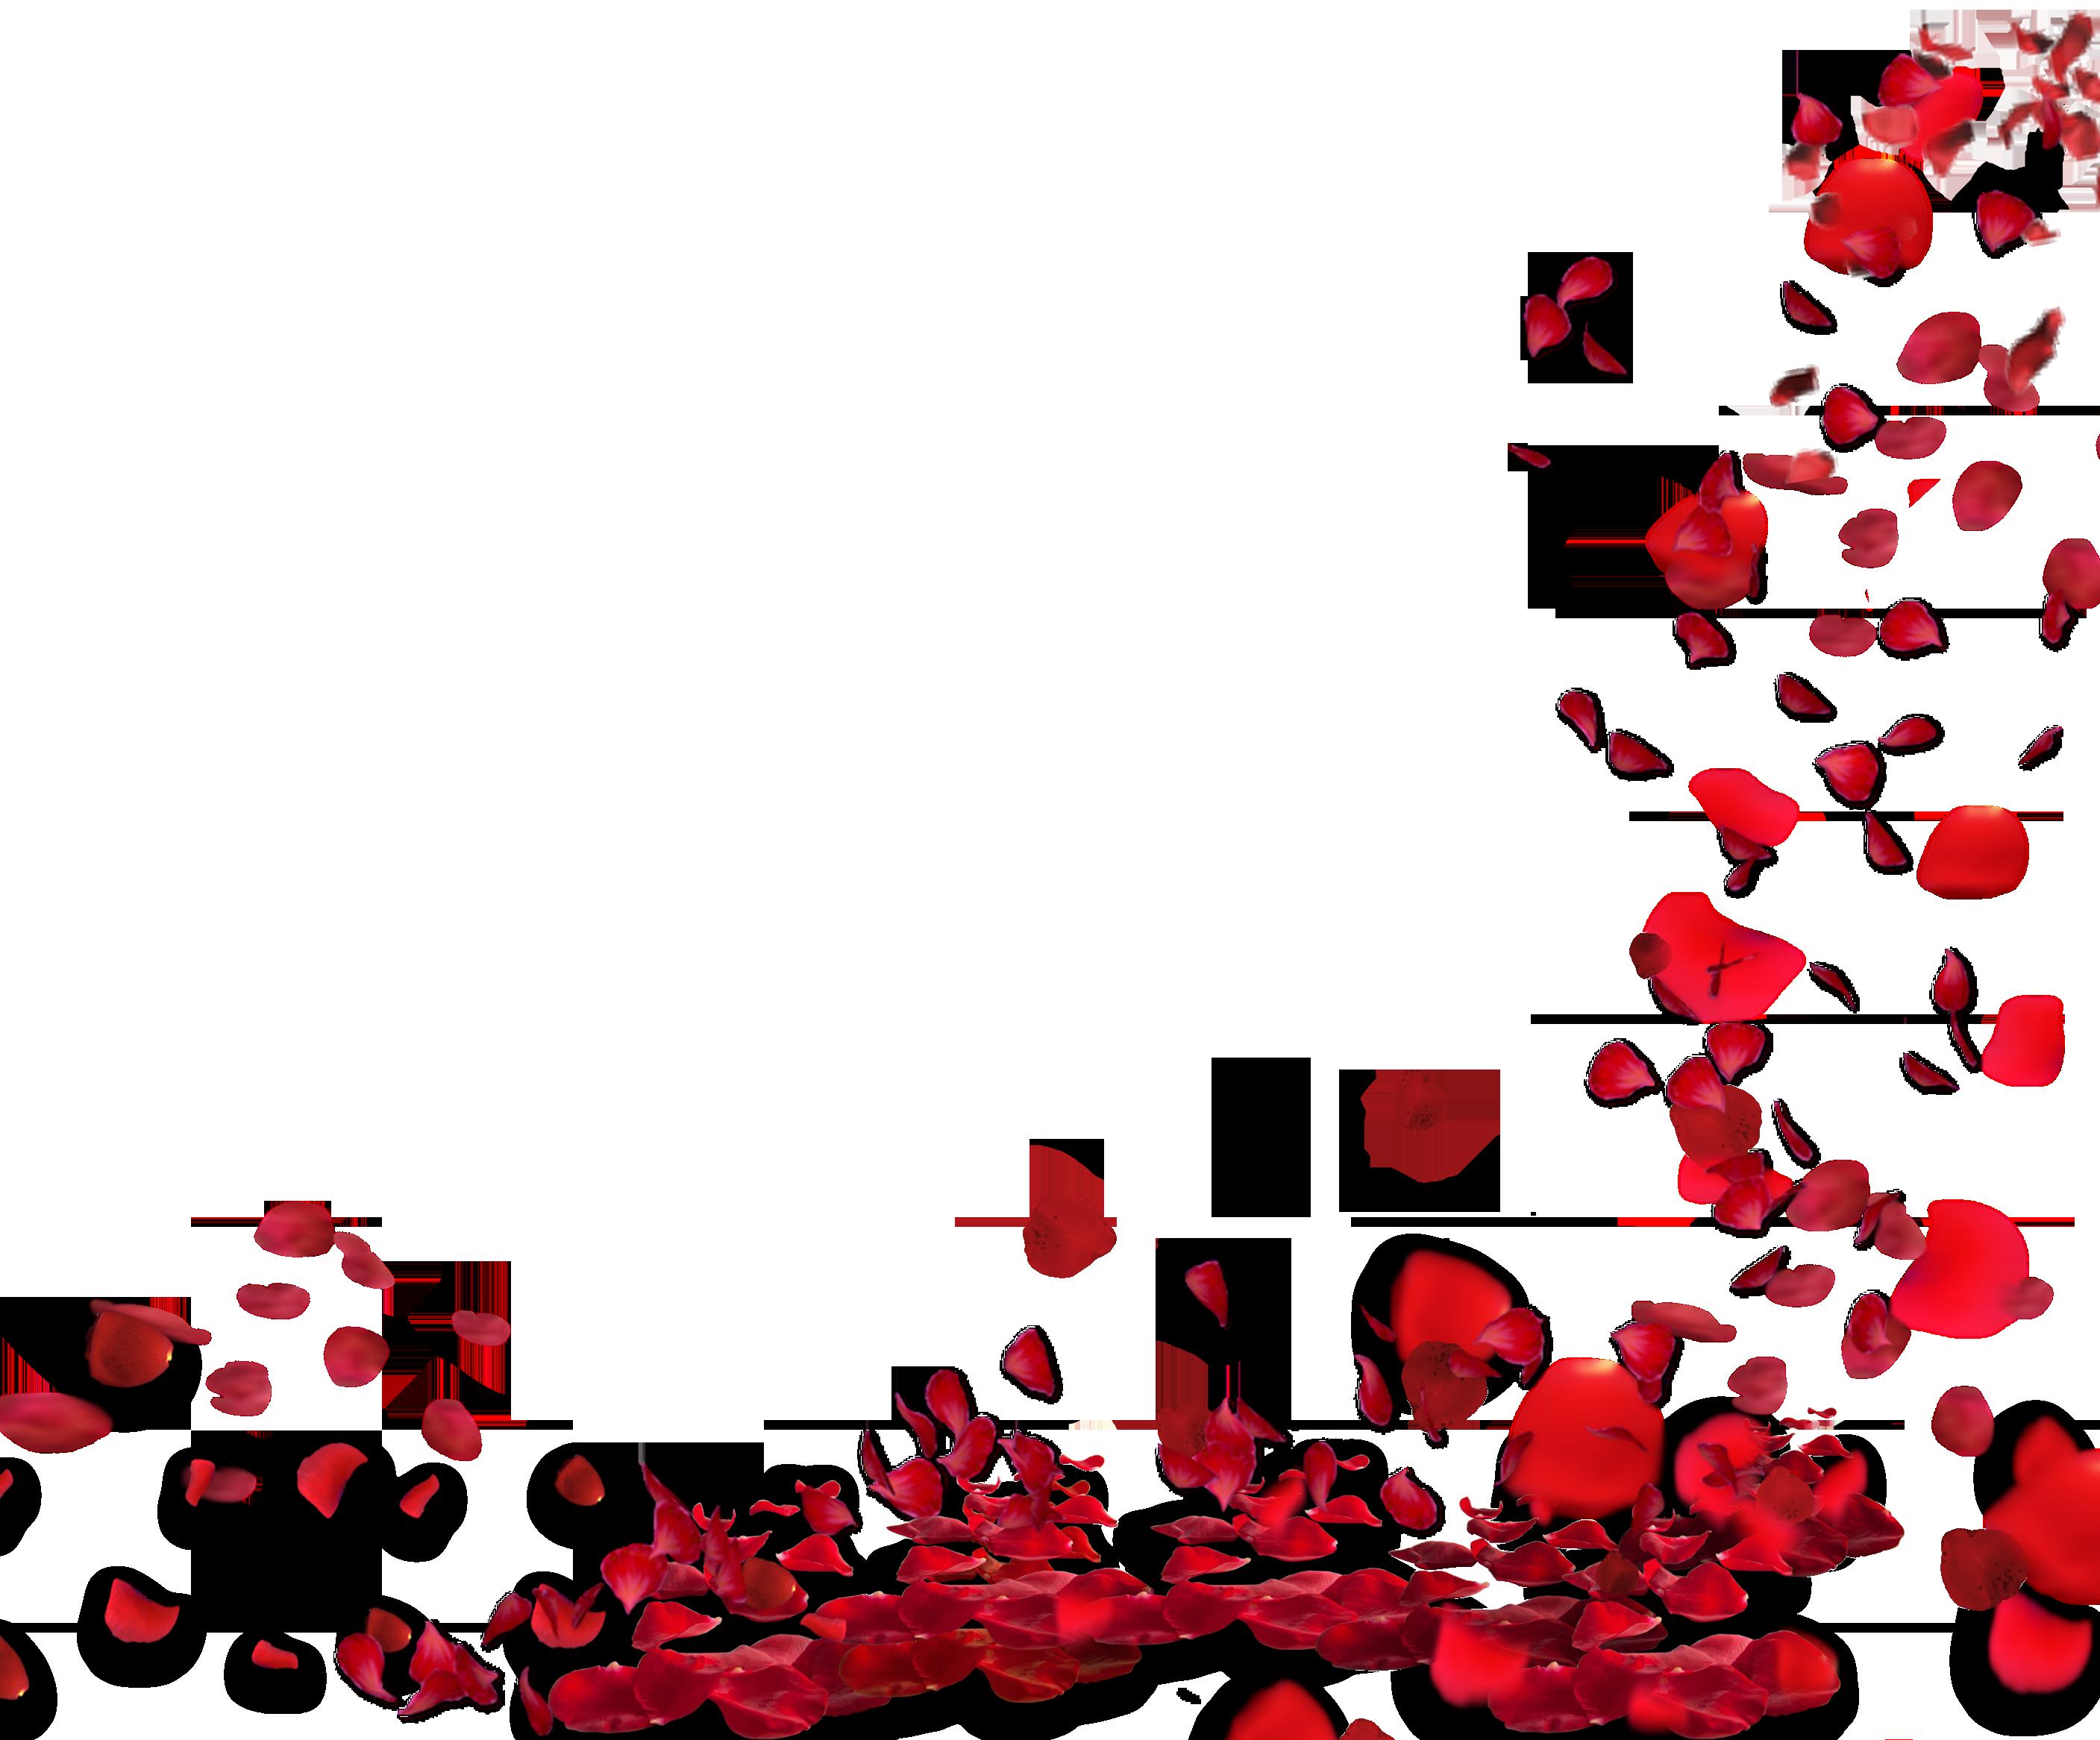 Flower petals falling clipart. Rose png images hd